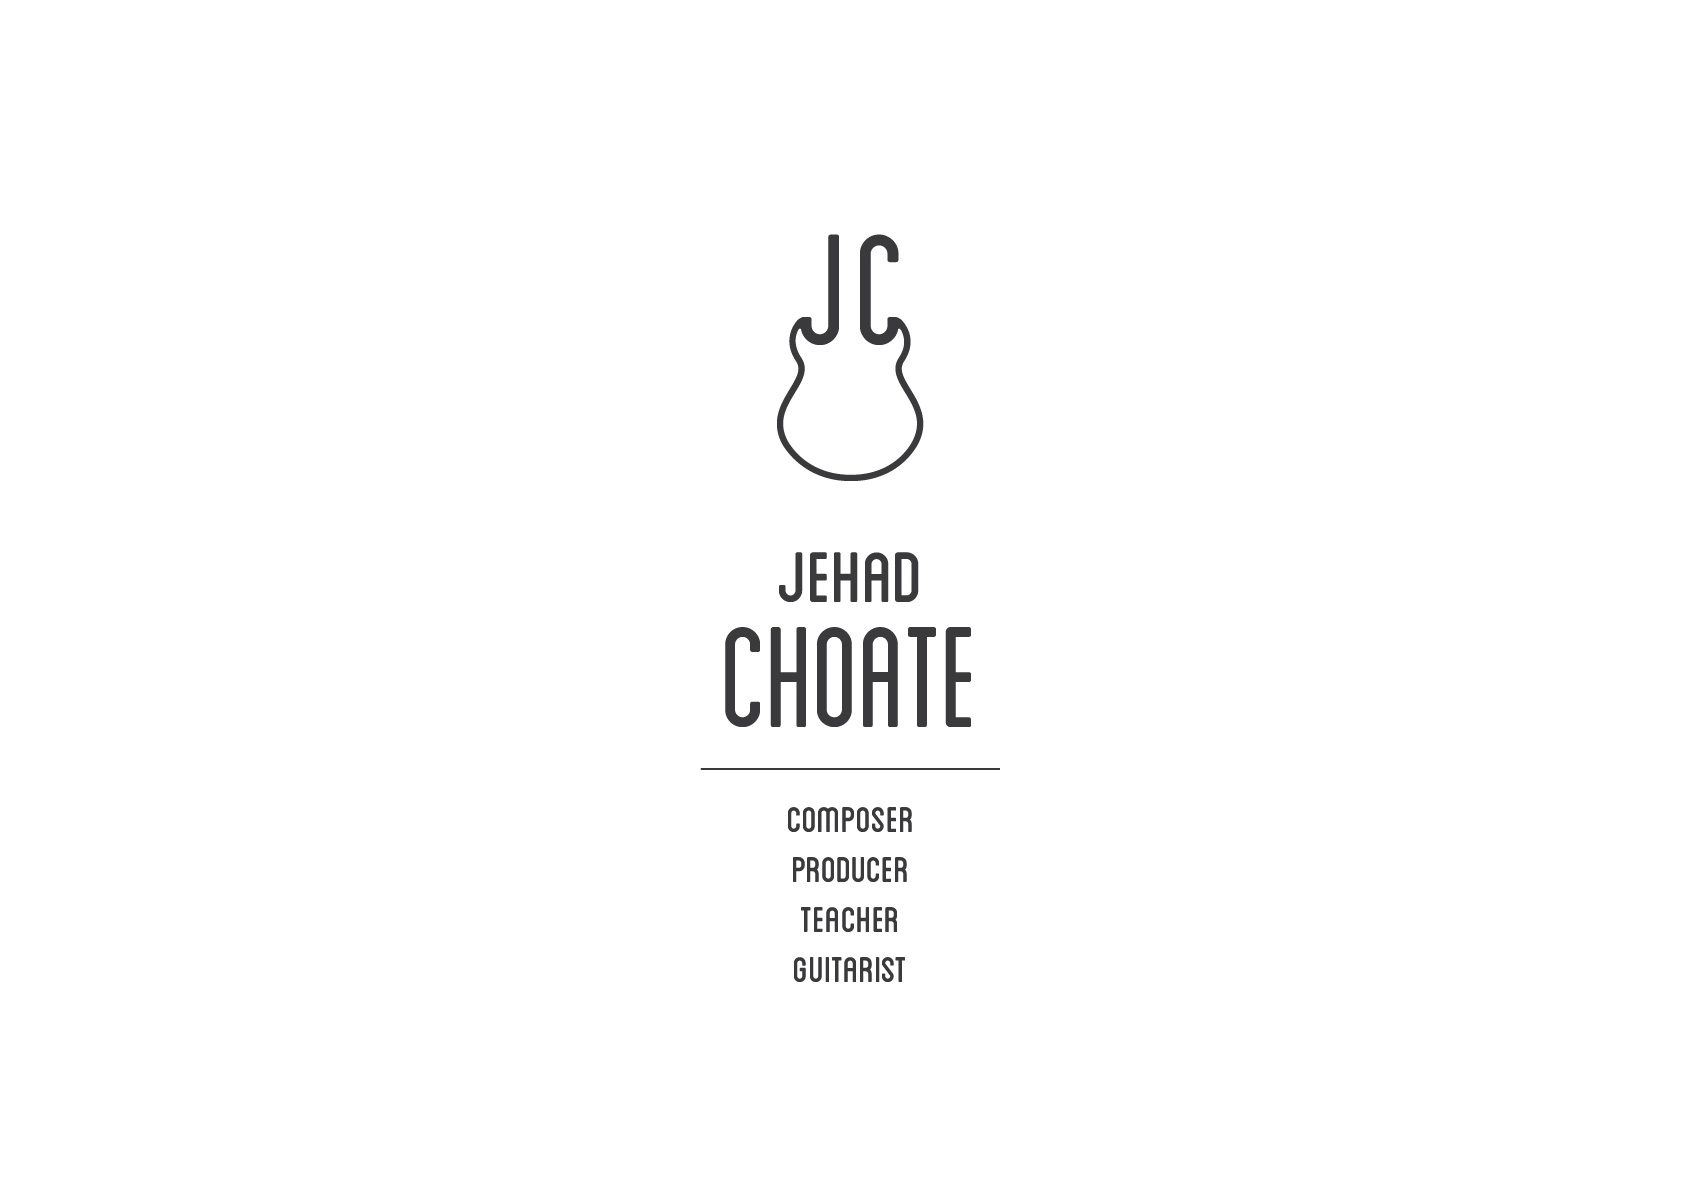 Jehad Choate